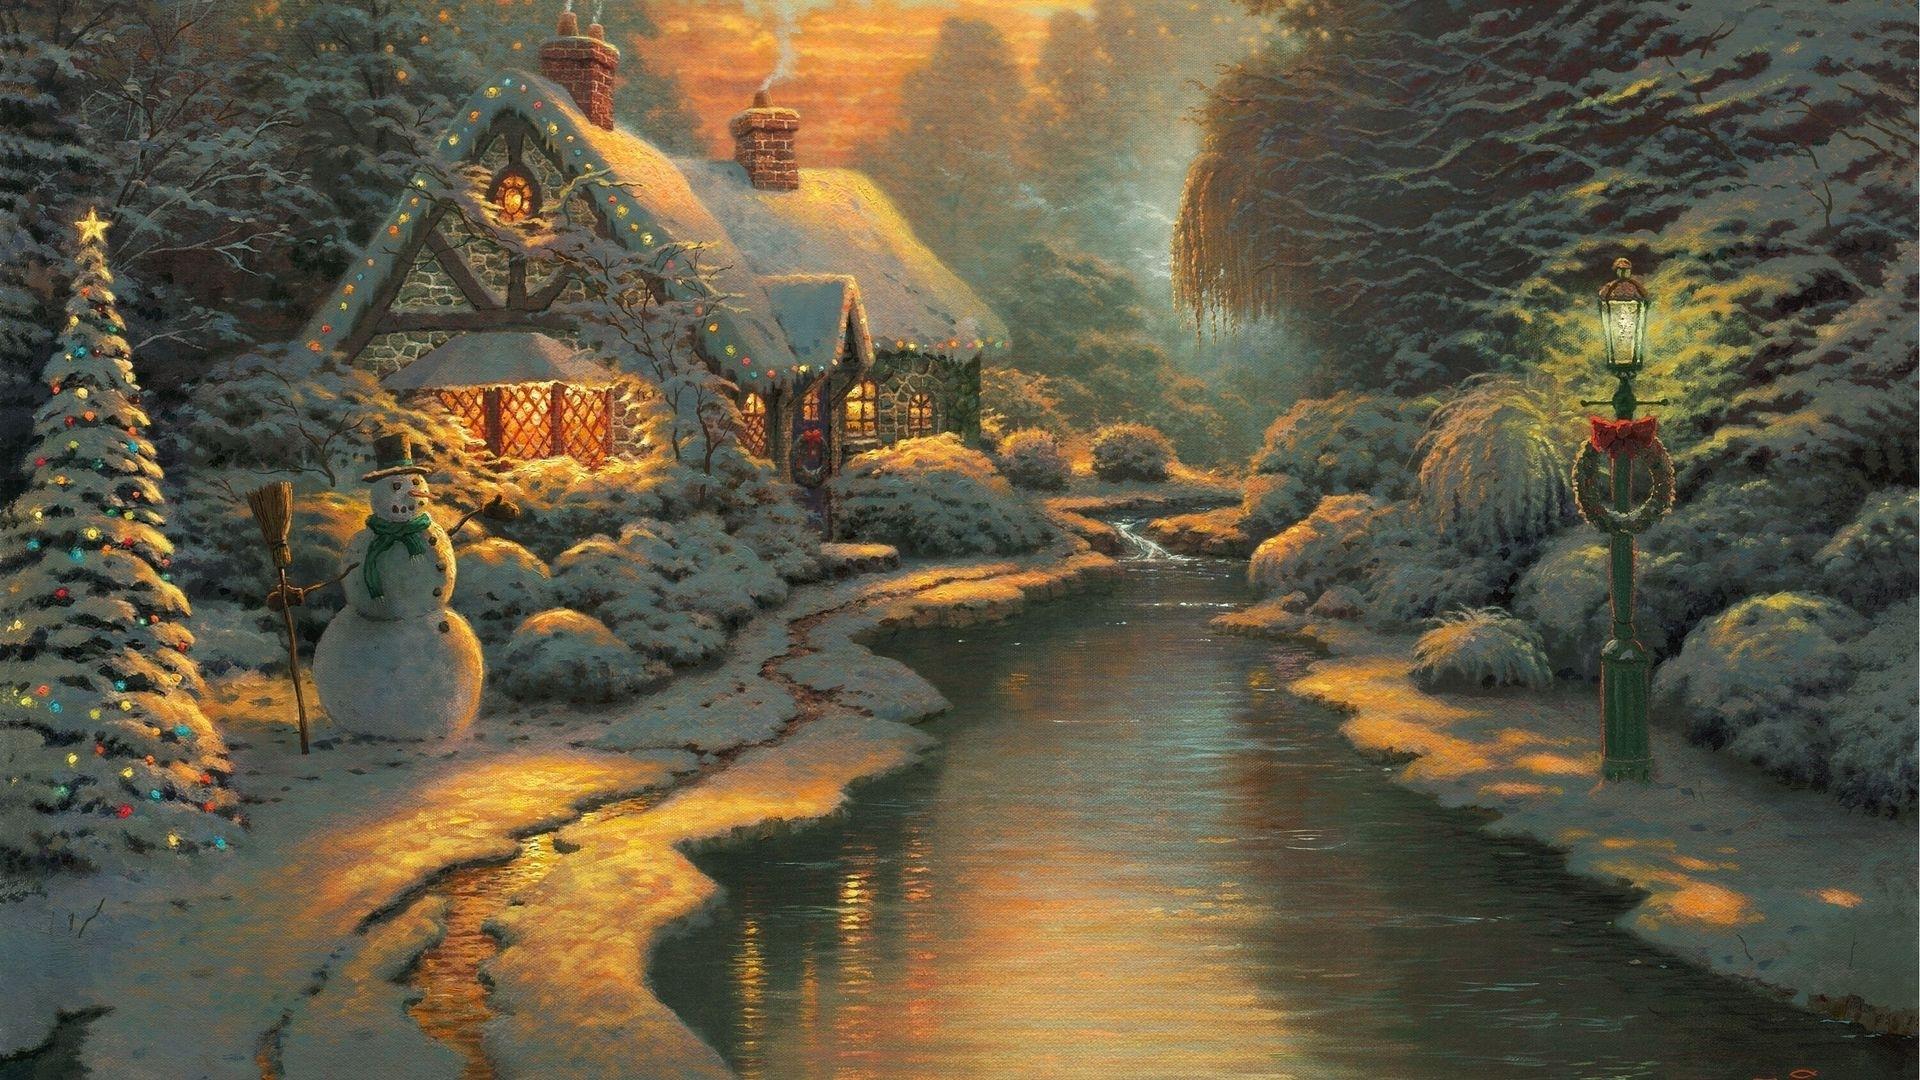 free christmas screensavers | božić nova godina božićni ukrasi